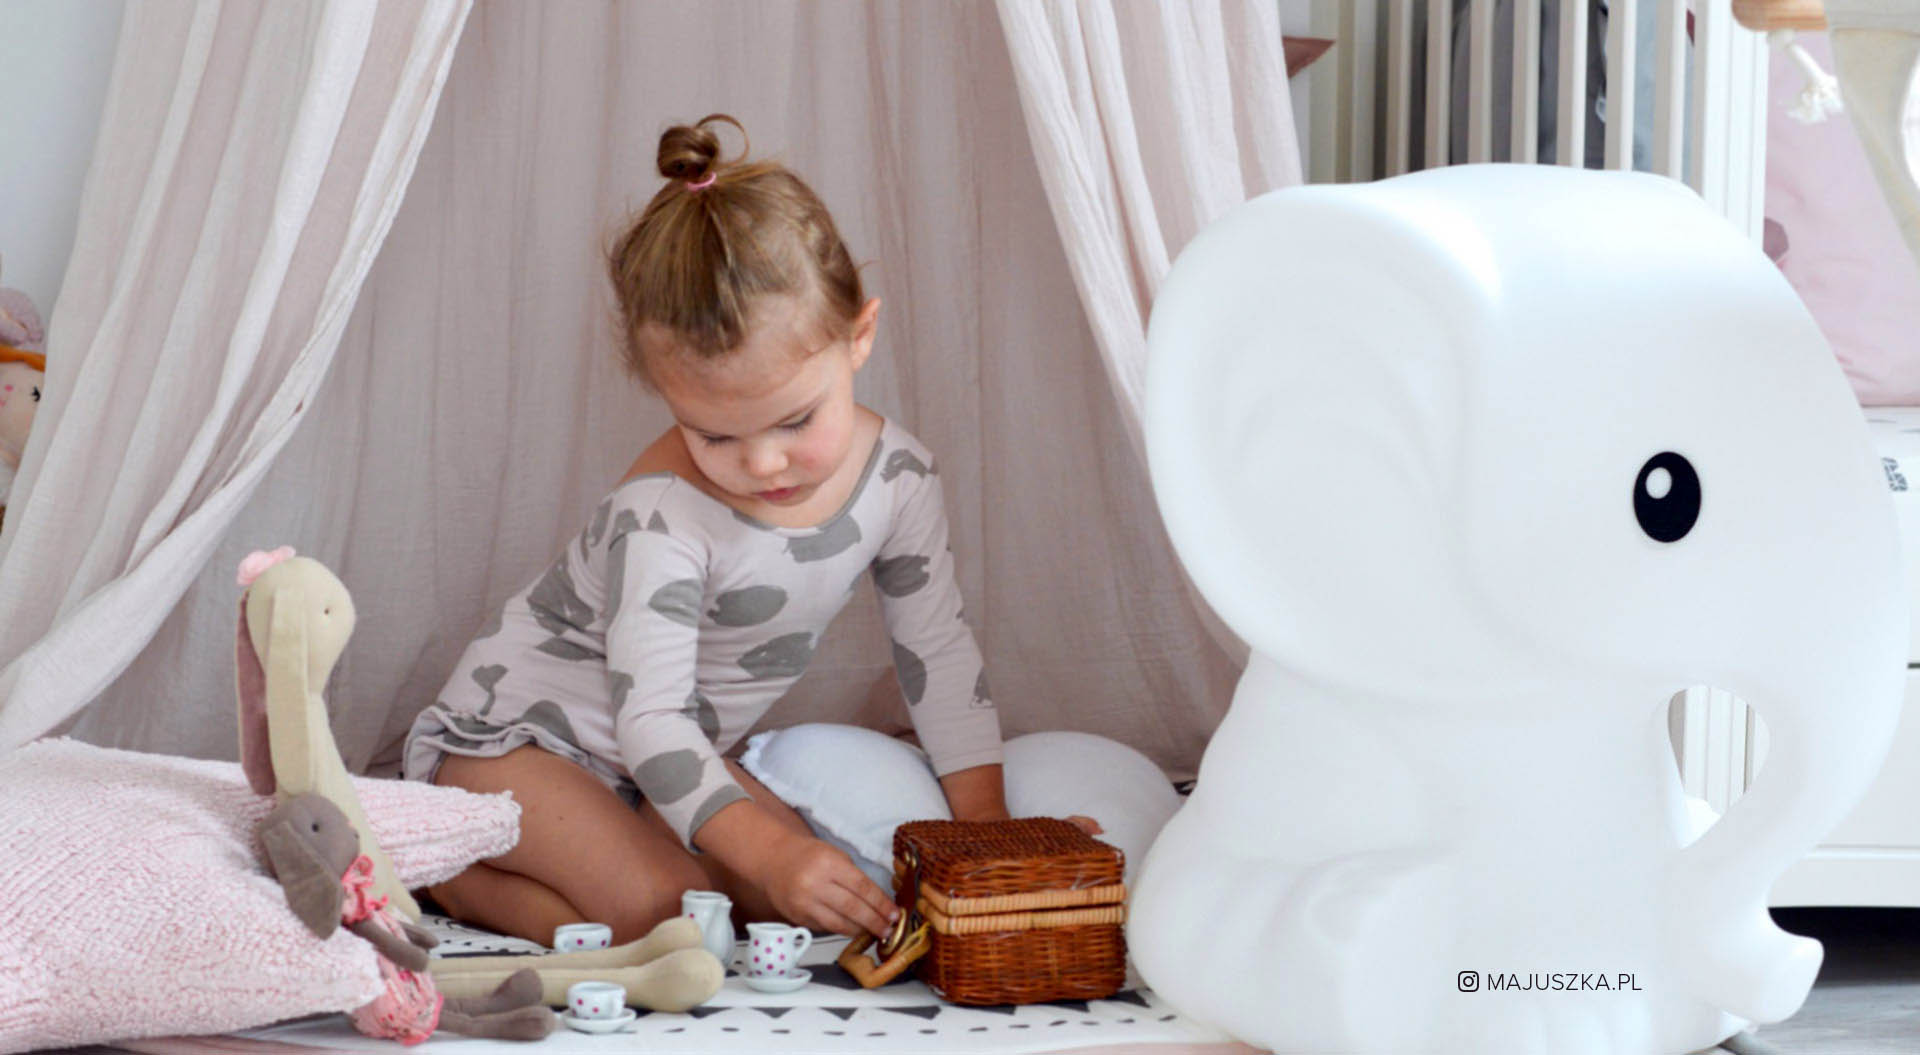 Anana Lamp Cloud elephant from Mr Maria Girl nursery room rabbit dolls and teaset